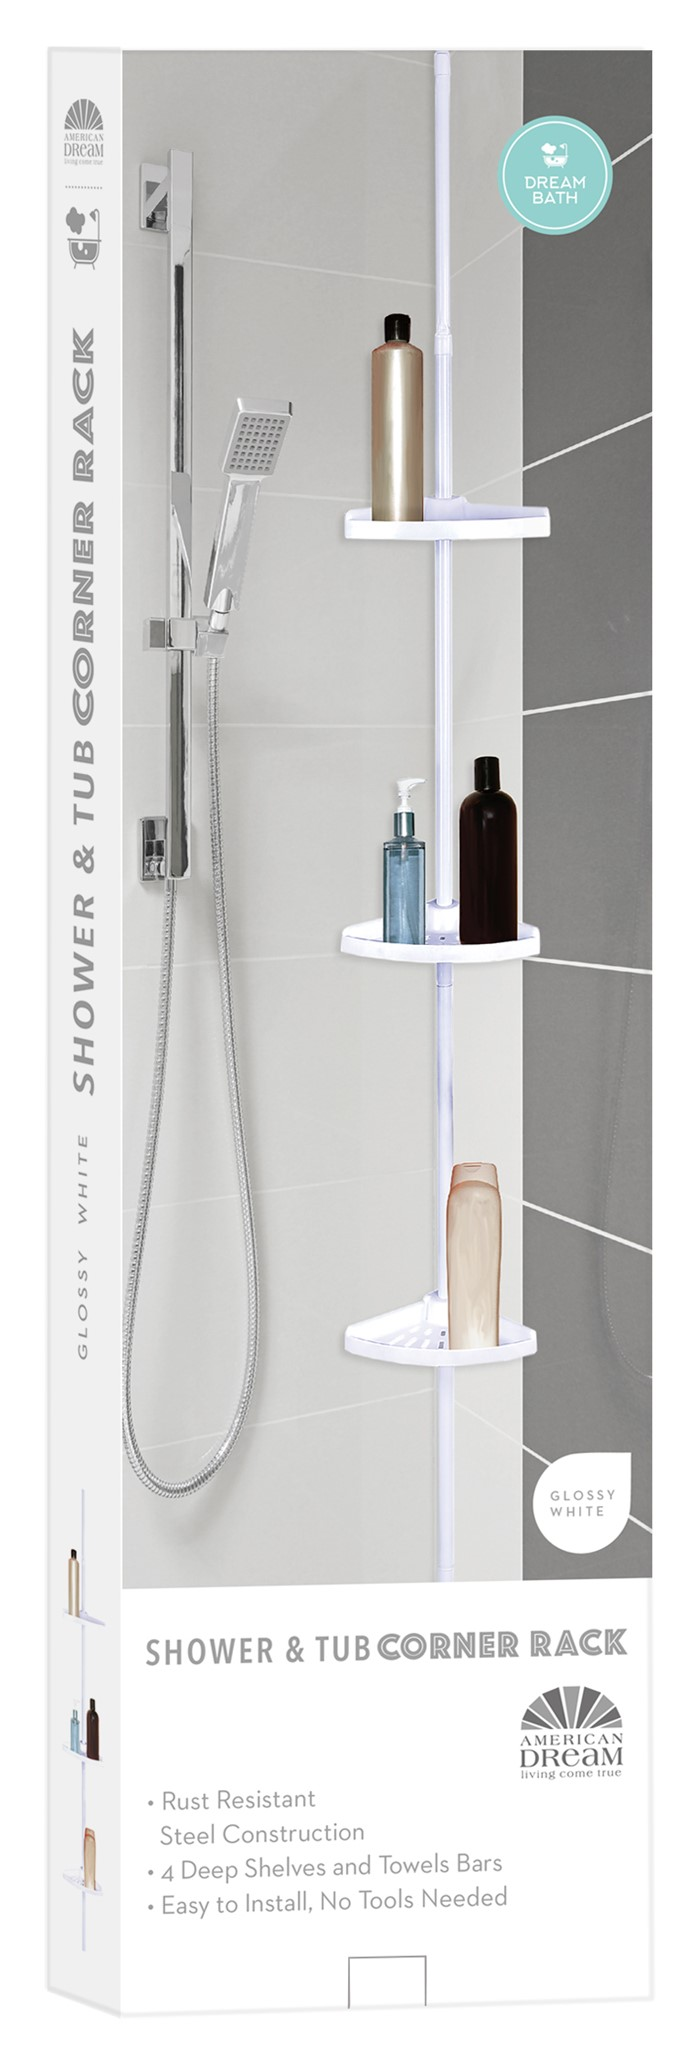 Bath - American Dream Home Goods Inc